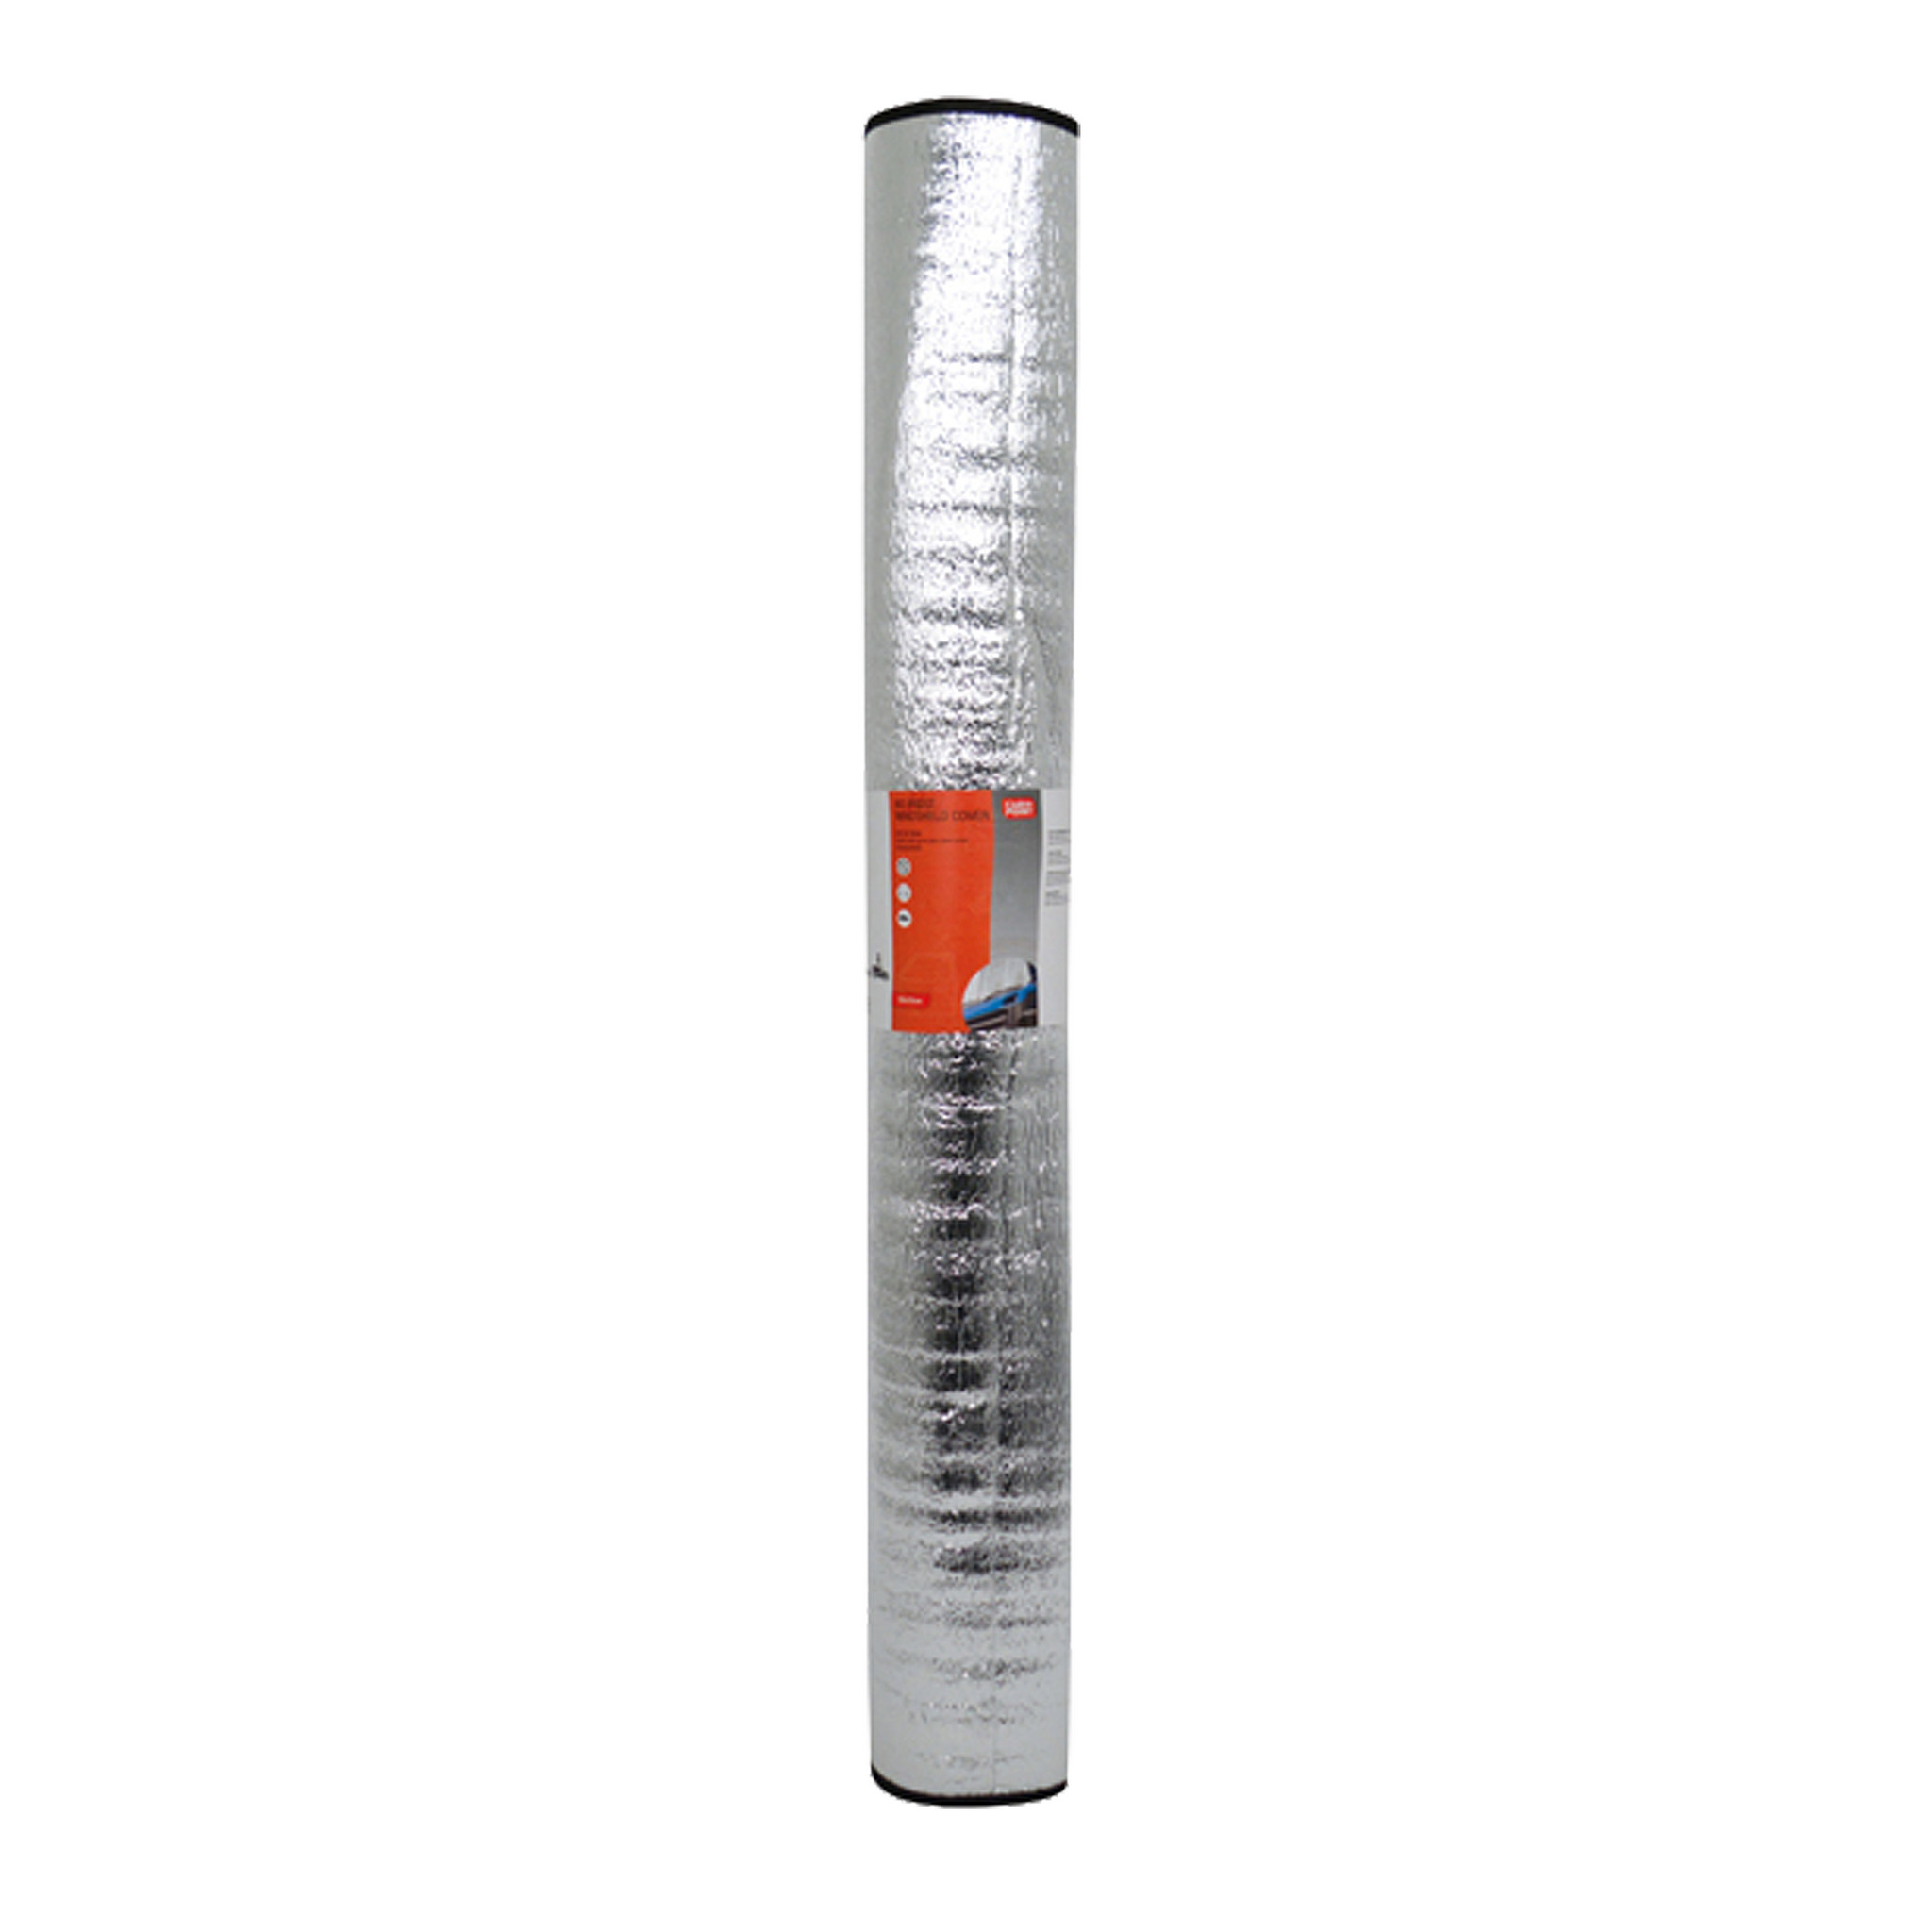 Carpoint Voorruitfolie 100x255cm